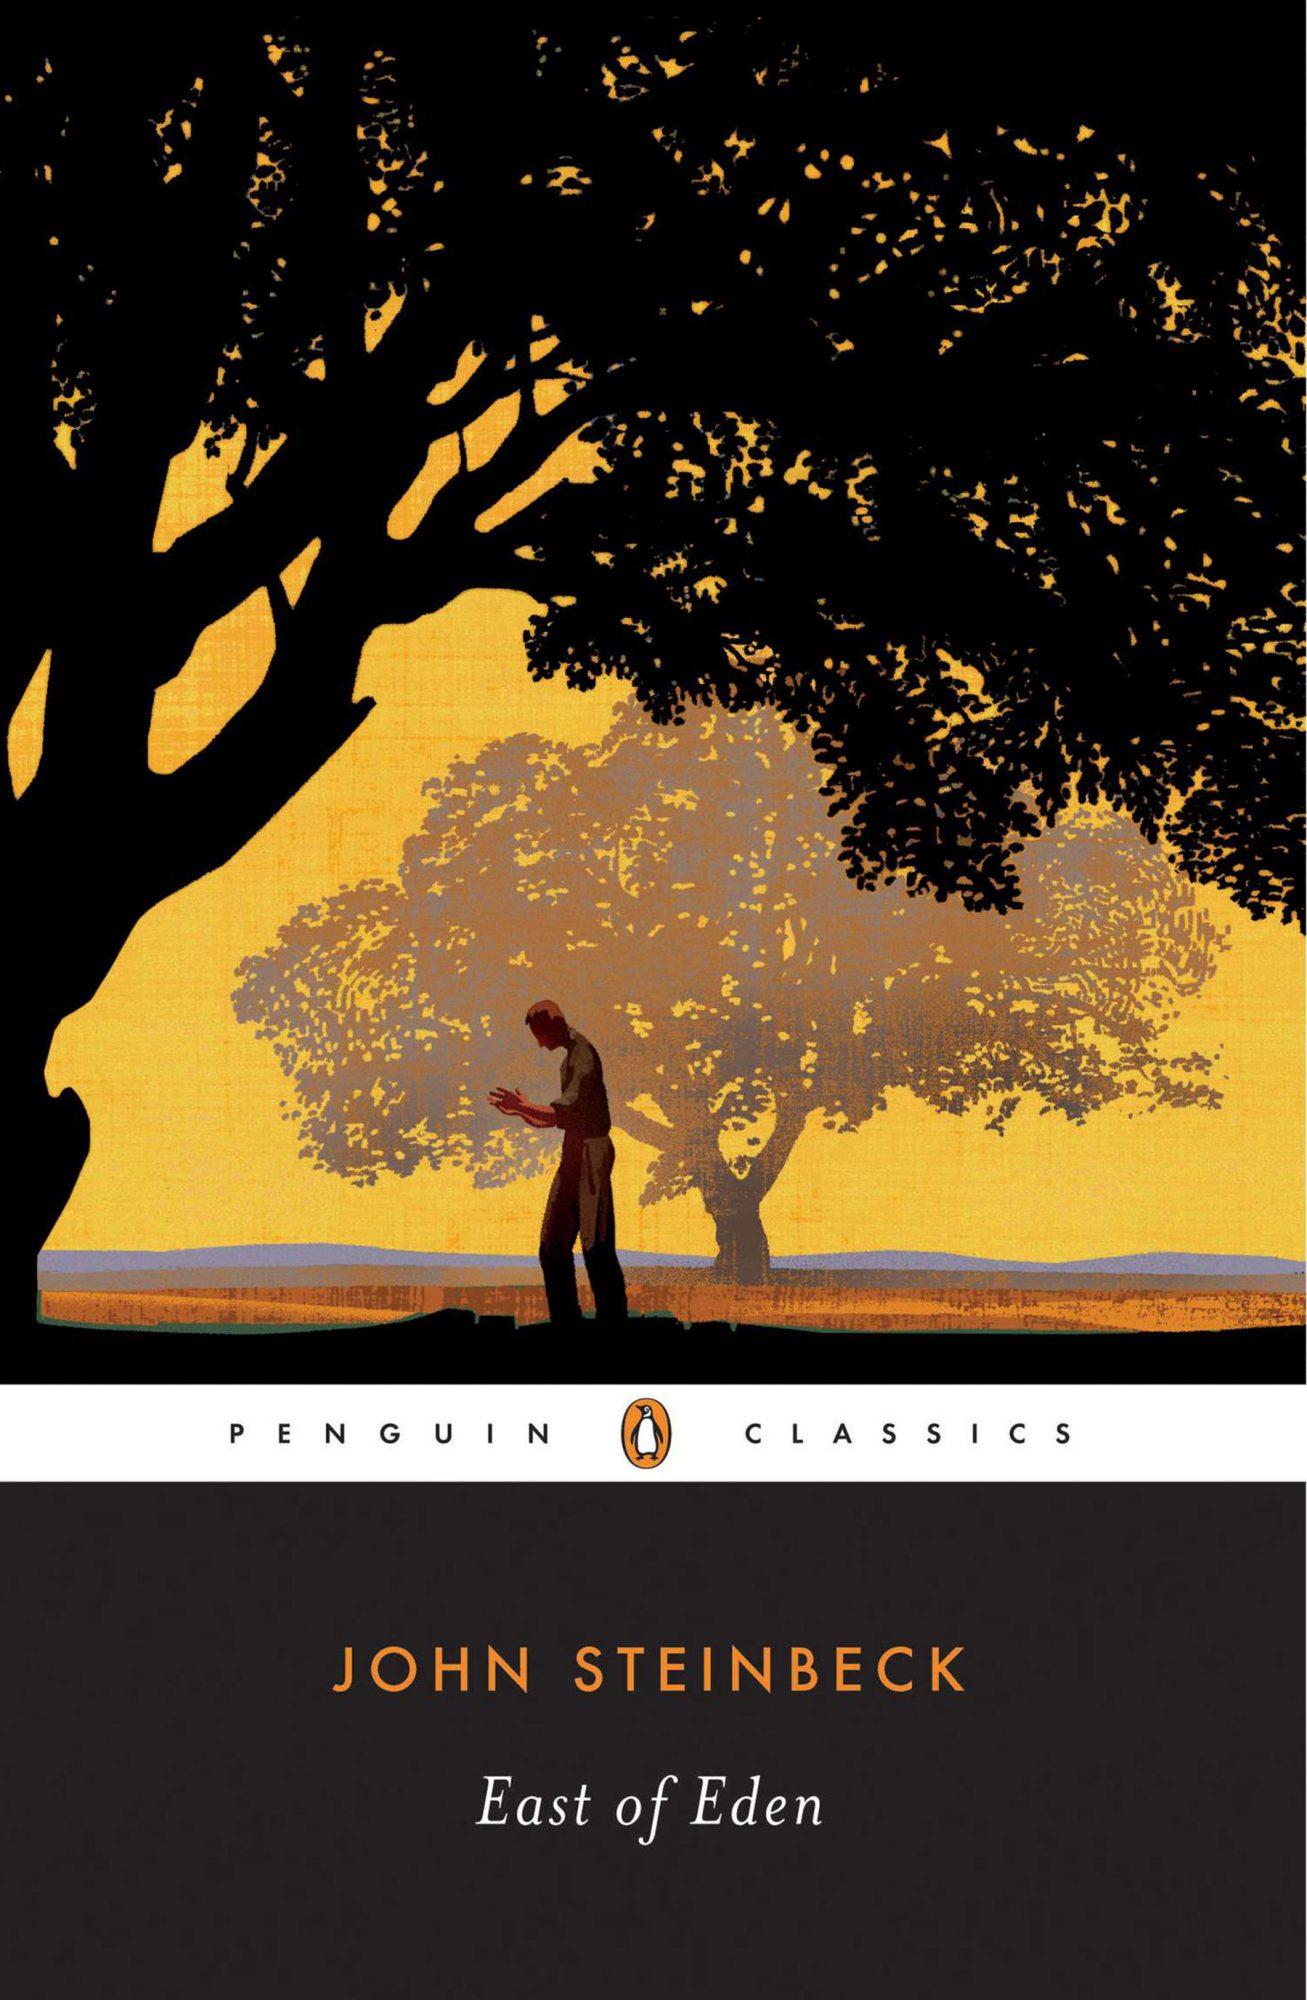 East of Eden (10/28/1992)by John Steinbeck